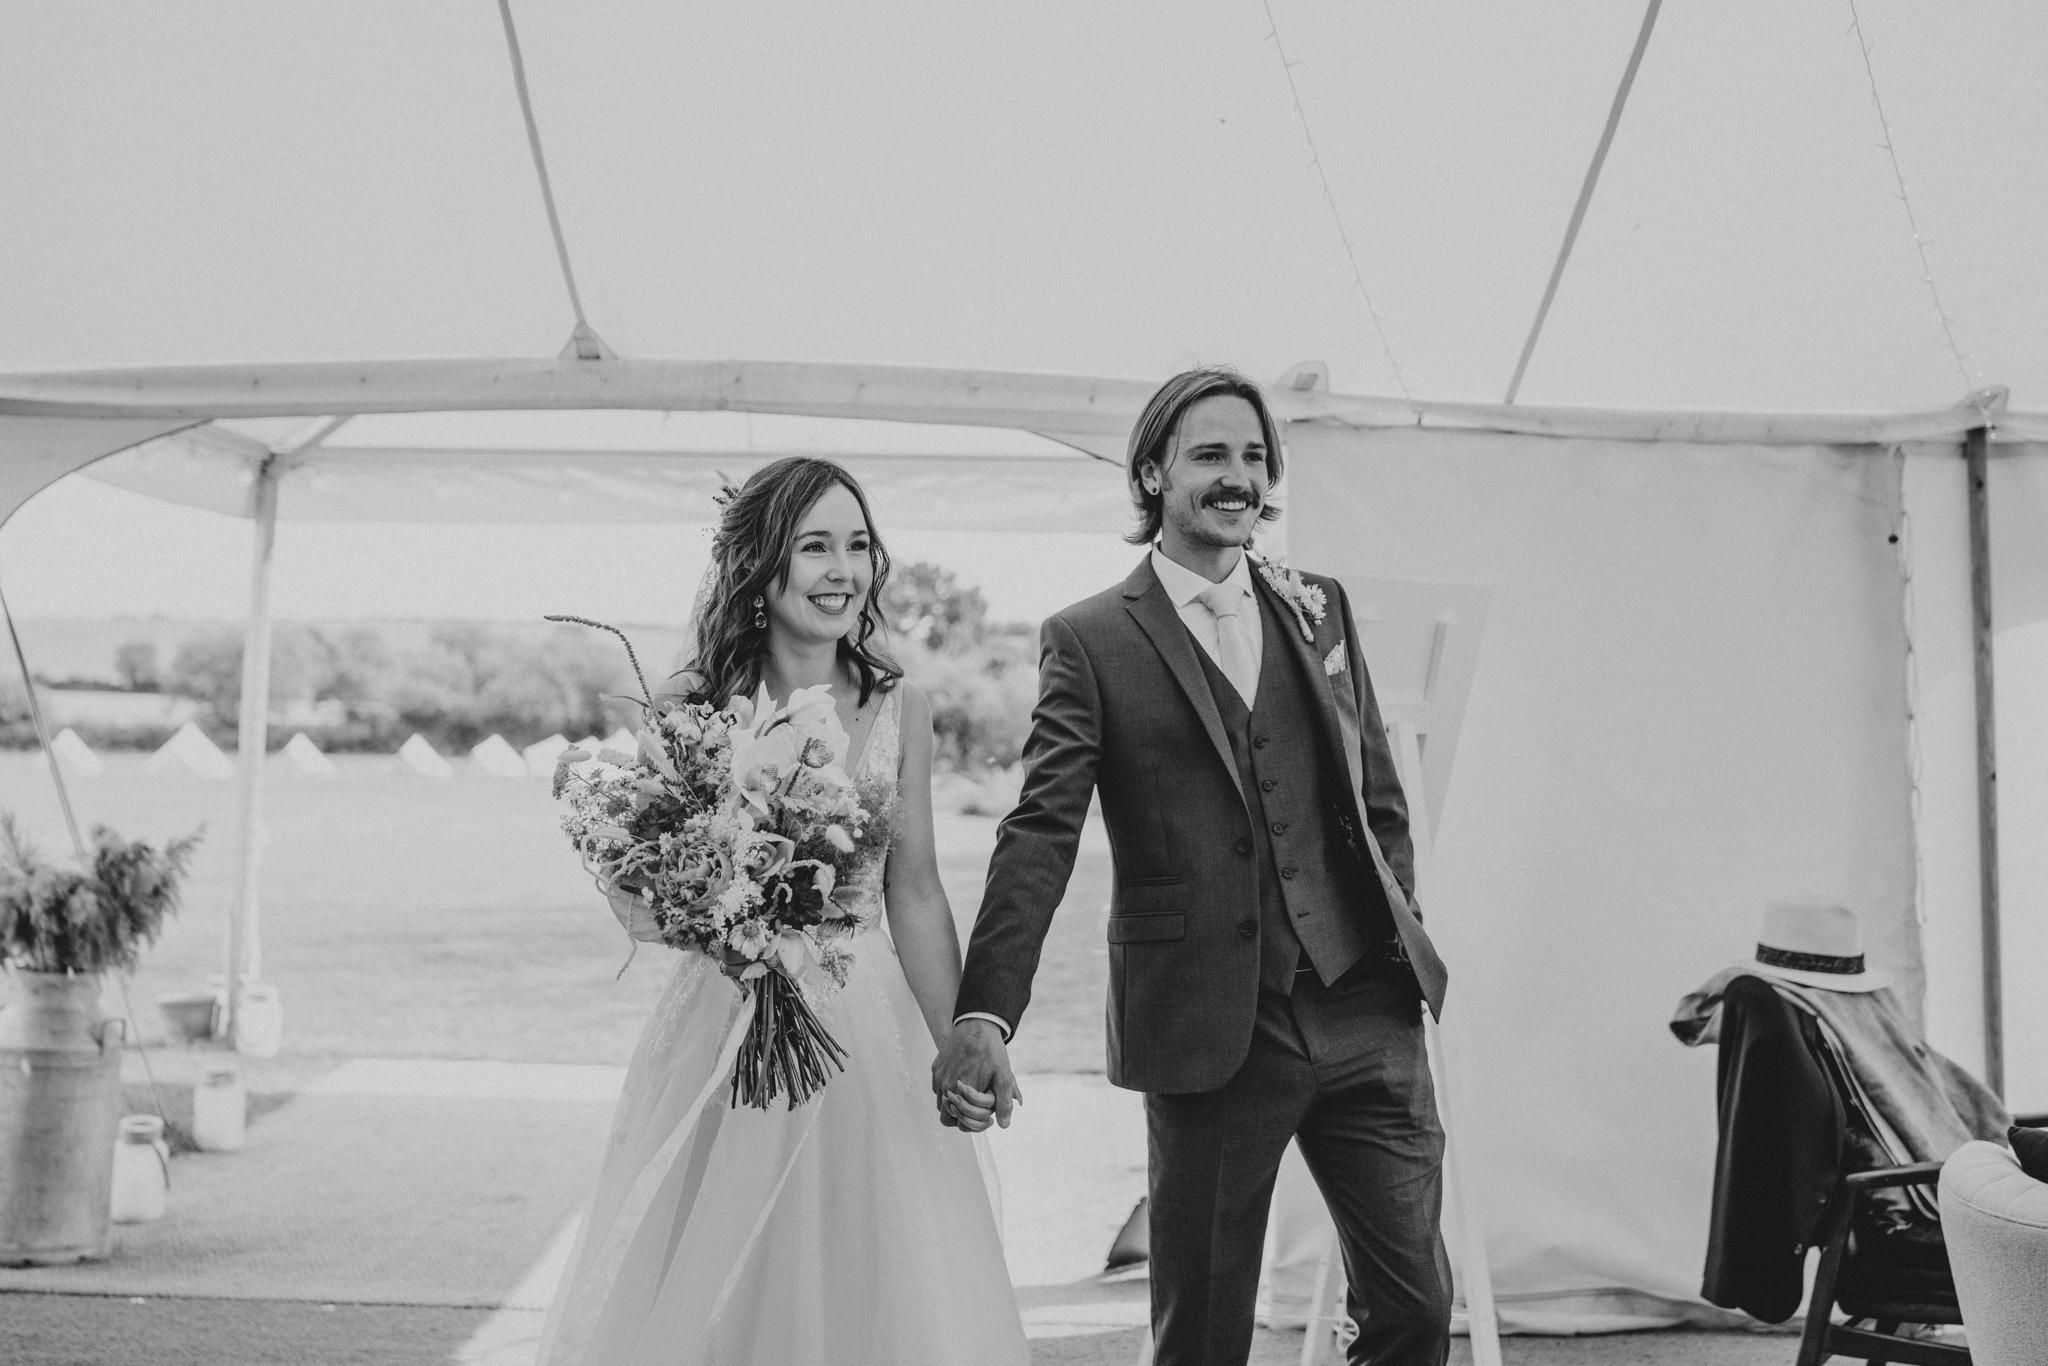 emi-Jack-boho-diy-wedding-eggington-house-grace-elizabeth-colchester-essex-alternative-wedding-photographer-suffolk-norfolk-devon (35 of 56).jpg